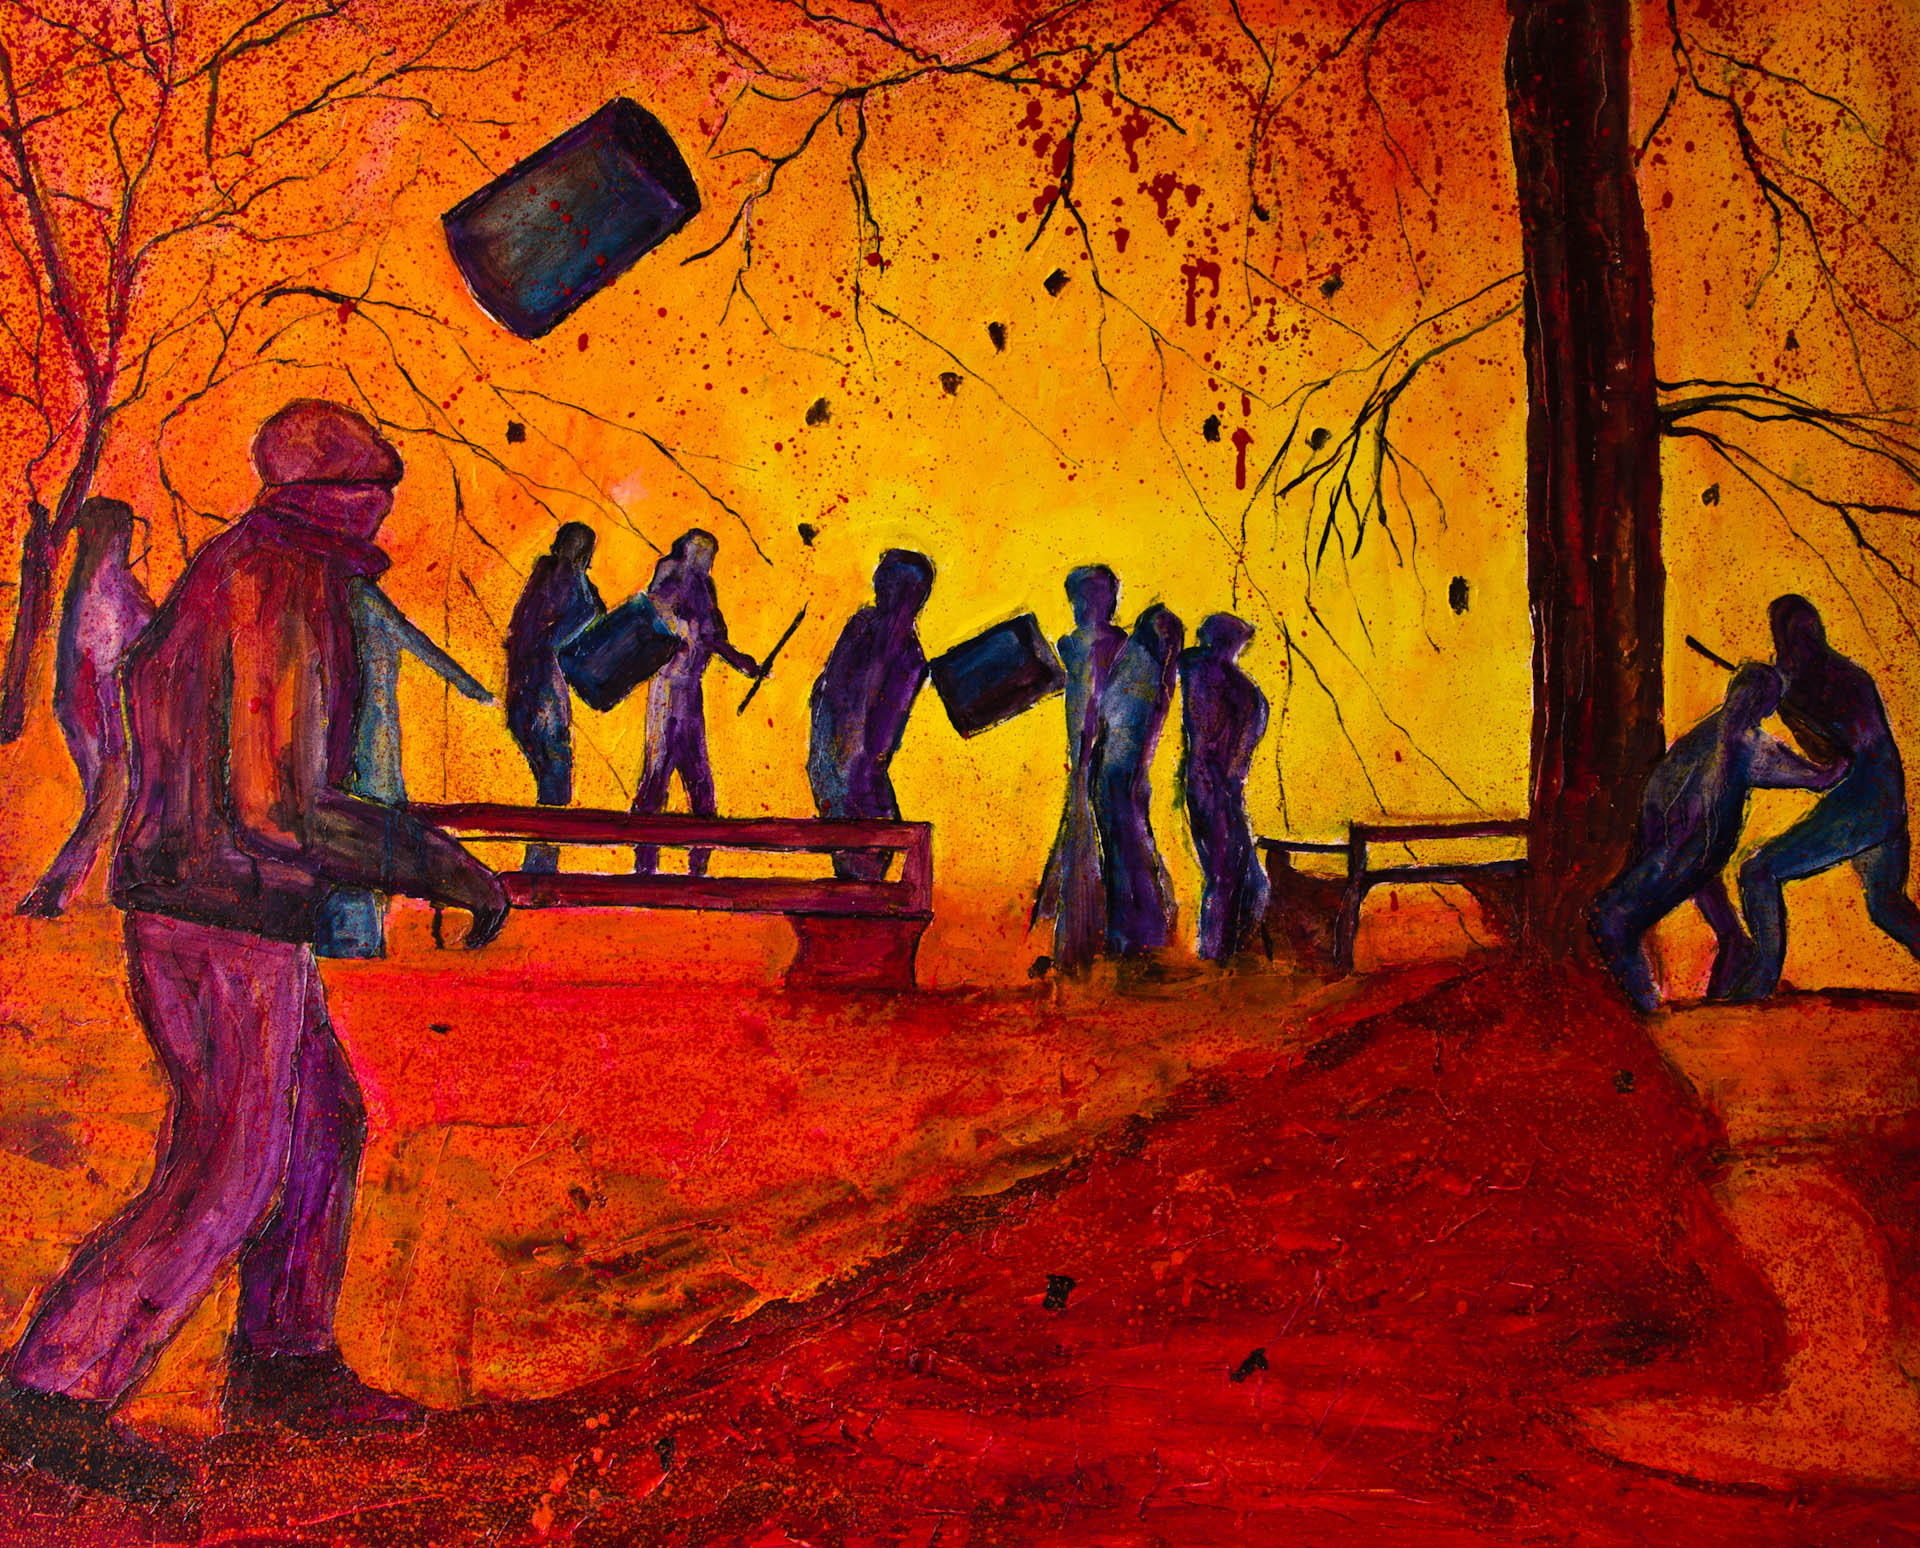 Gregor Pratneker - Fighting figures; oil on wood; 2013